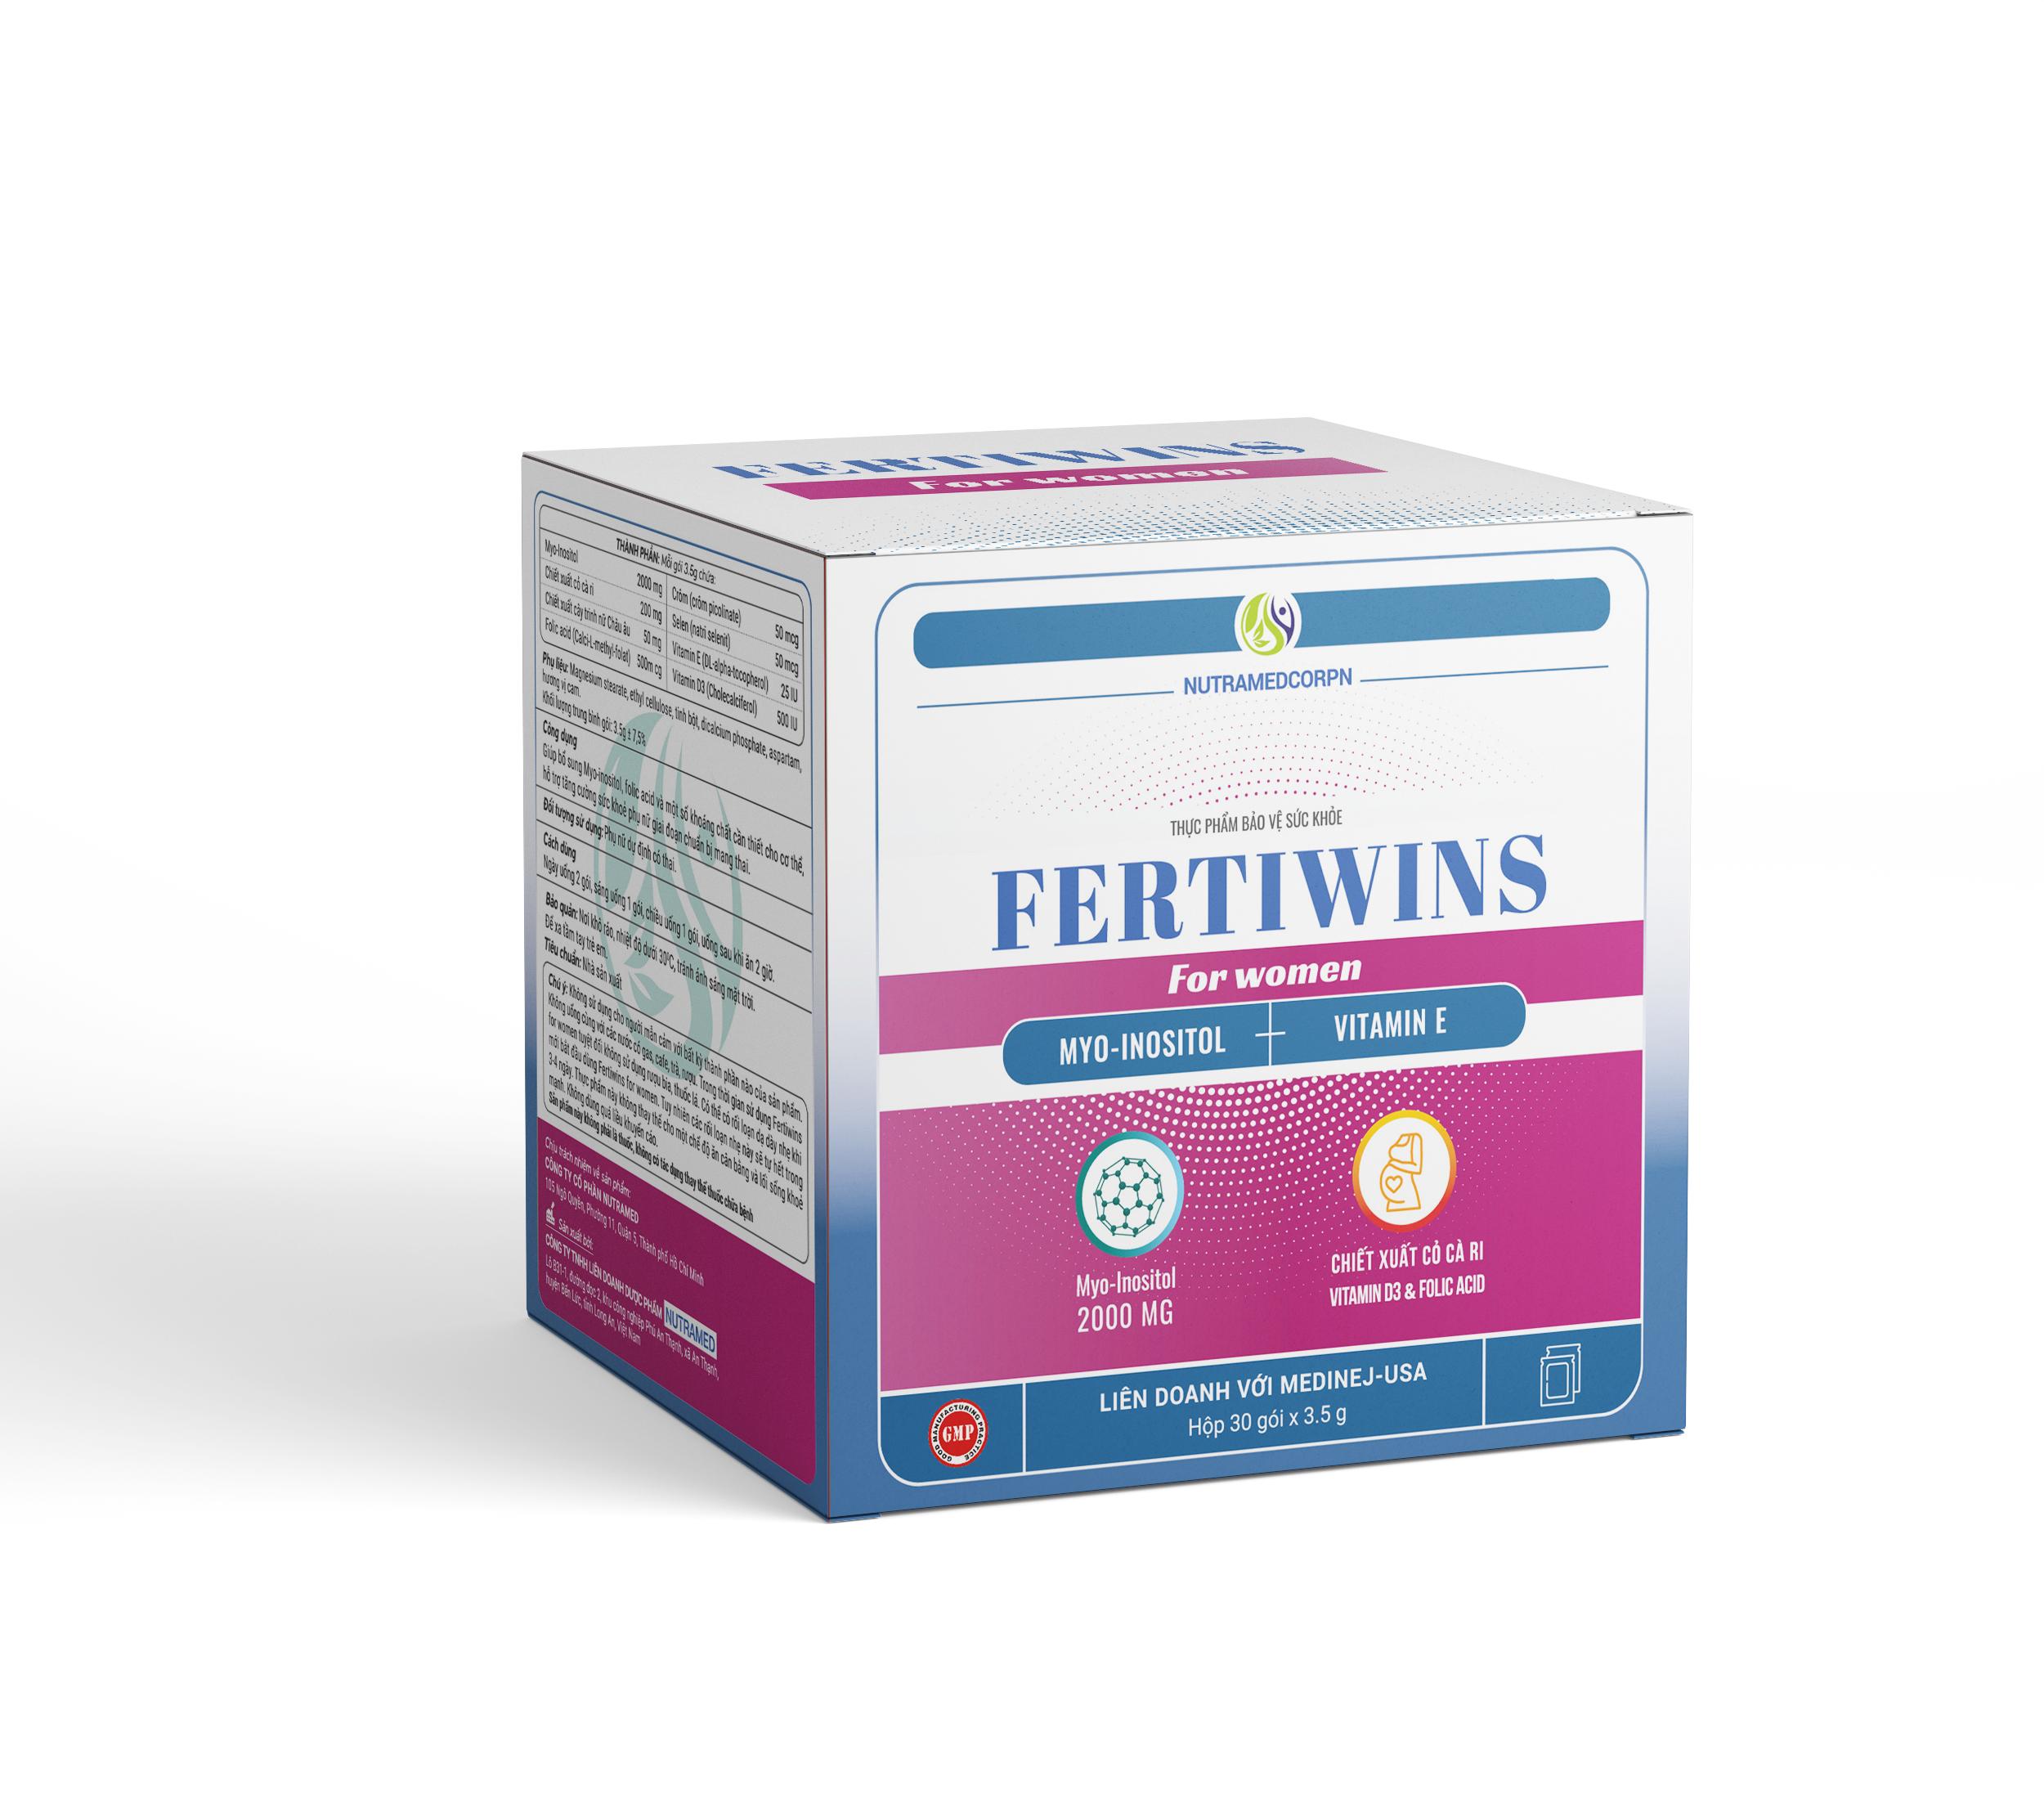 FERTIWINS FOR WOMEN